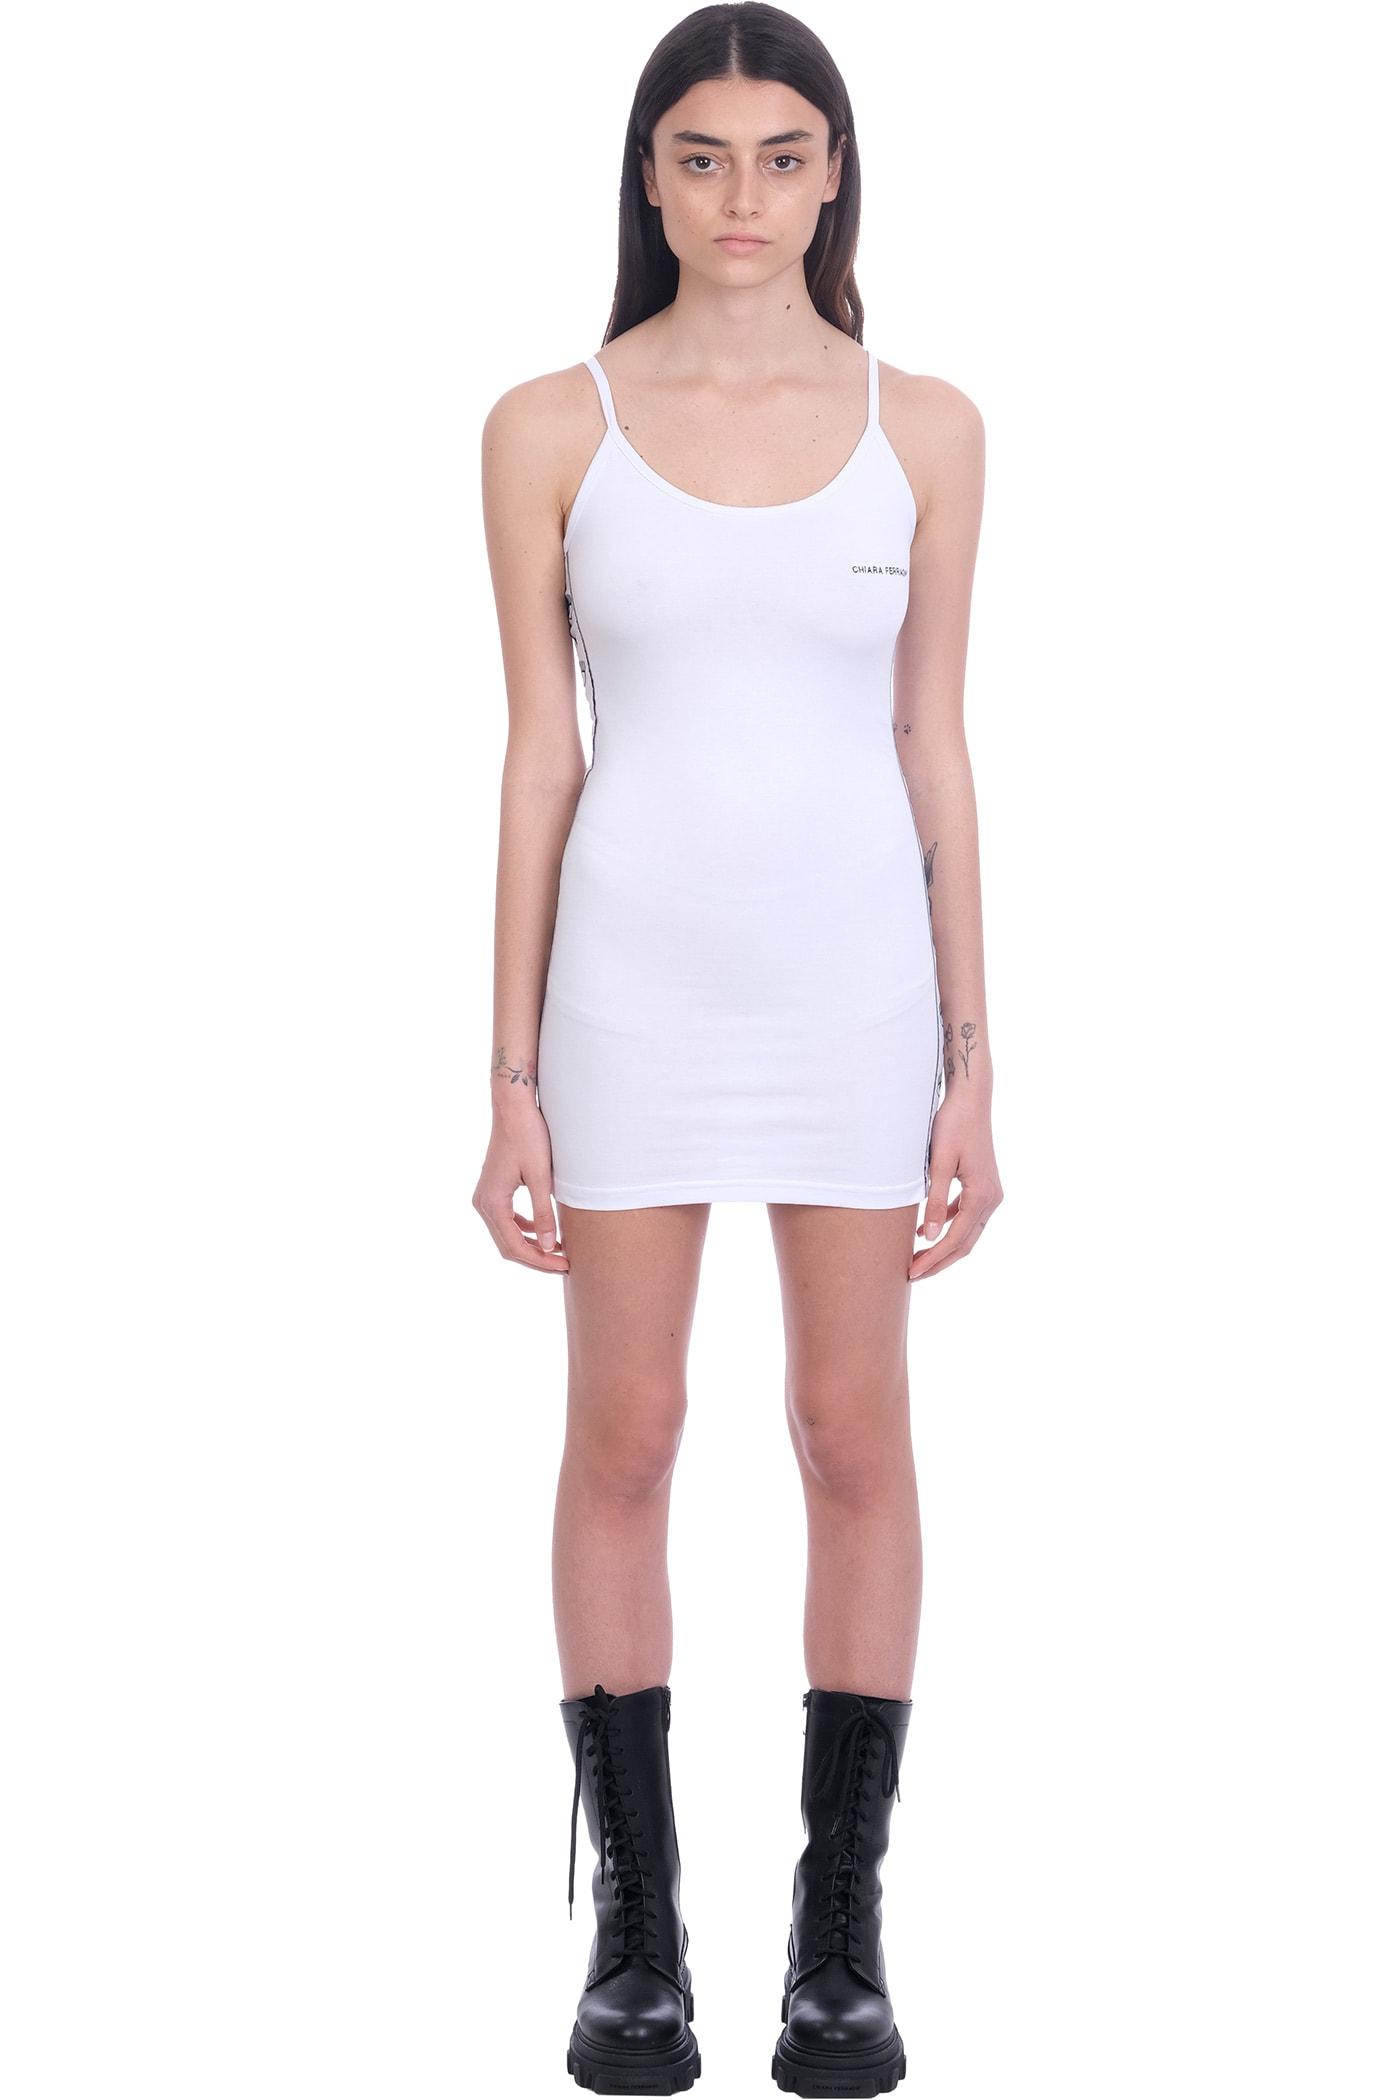 Buy Chiara Ferragni Dress In White Cotton online, shop Chiara Ferragni with free shipping